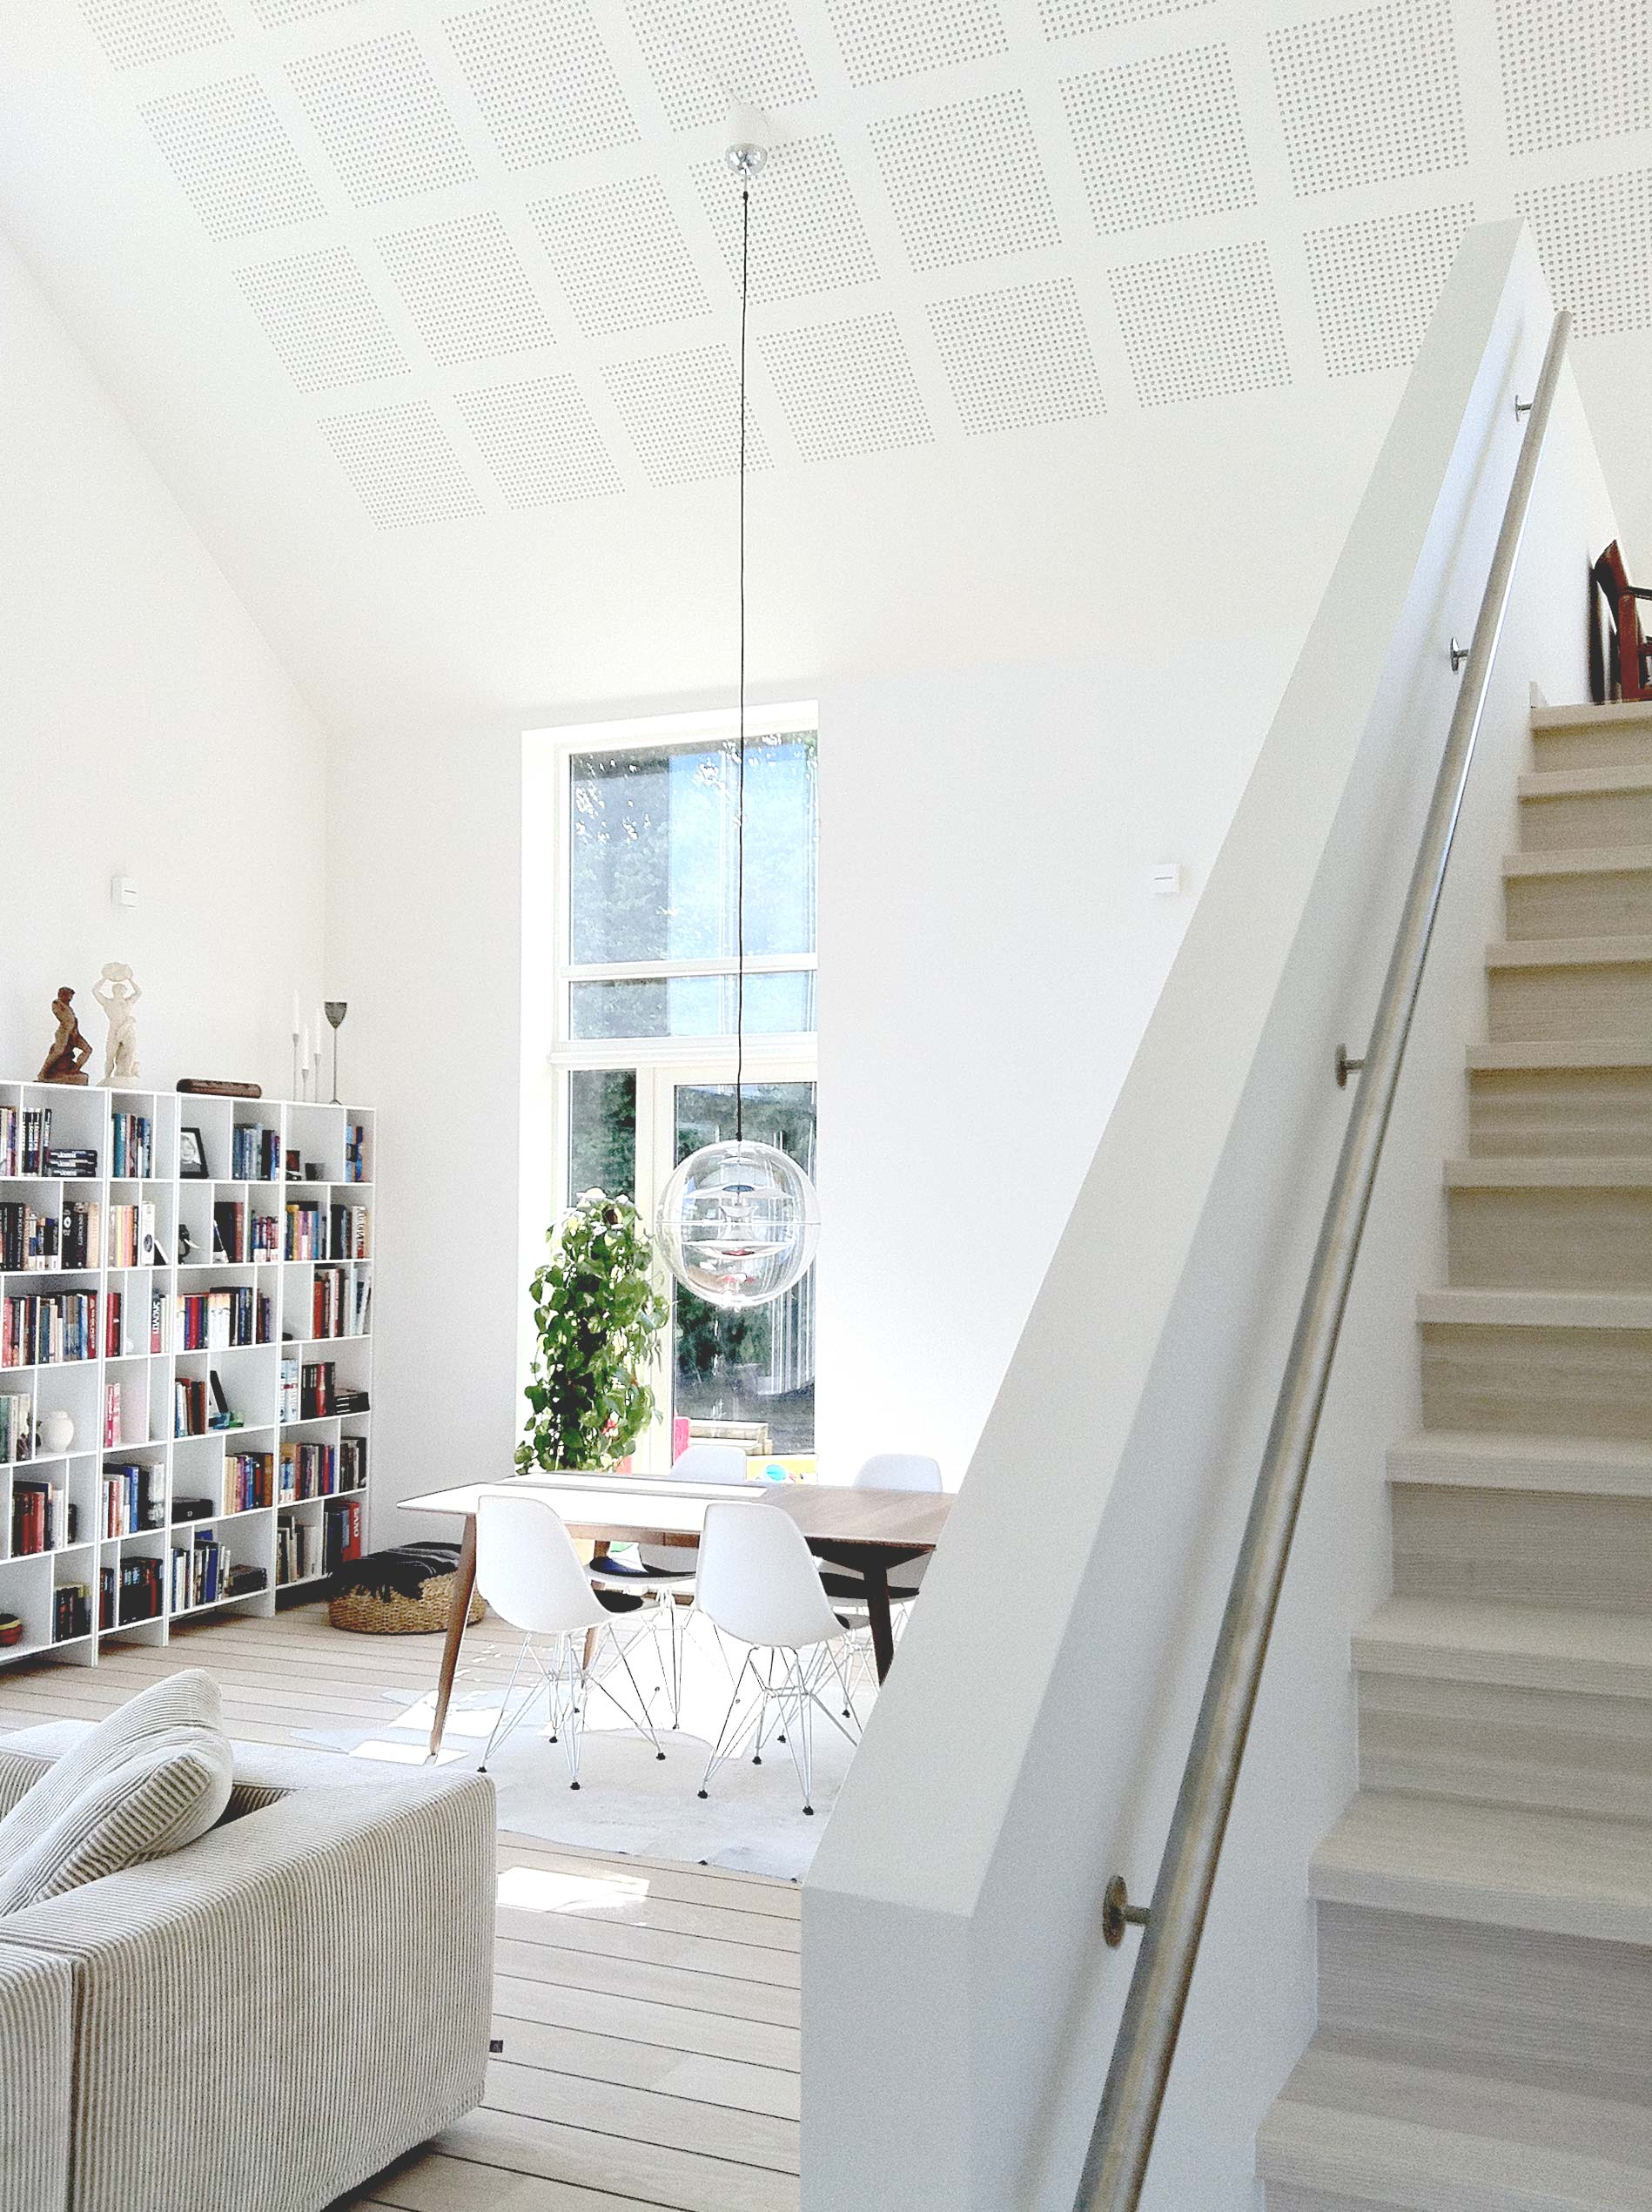 oneroom_arkitekttegnet_in_14.jpg